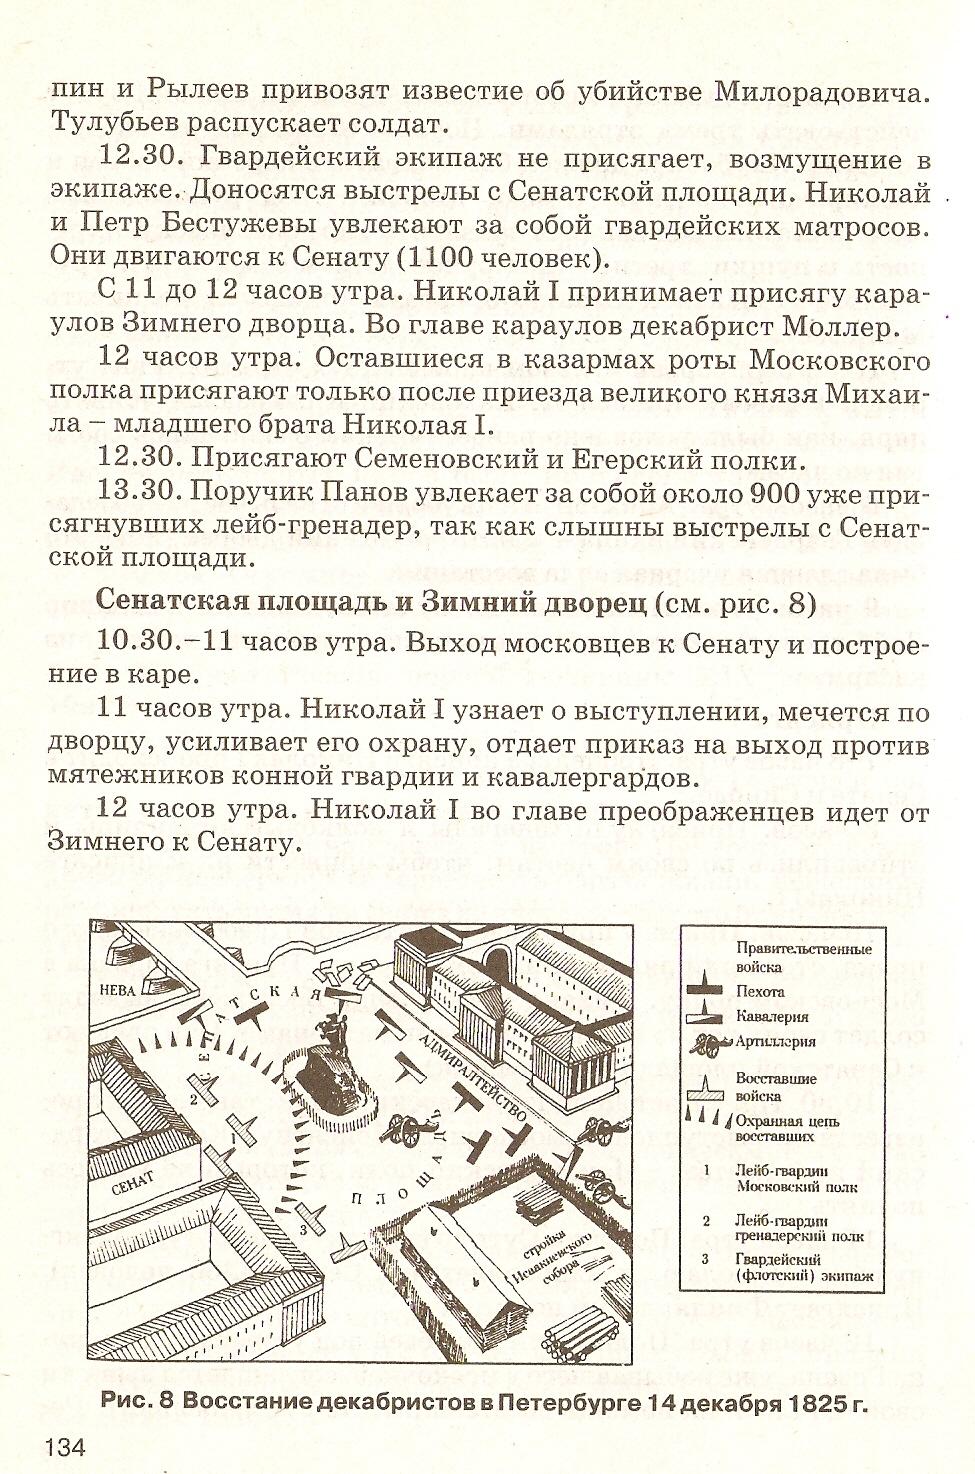 C:\Documents and Settings\Кораблёвы\Рабочий стол\Четвёртой\сканирование0002.jpg